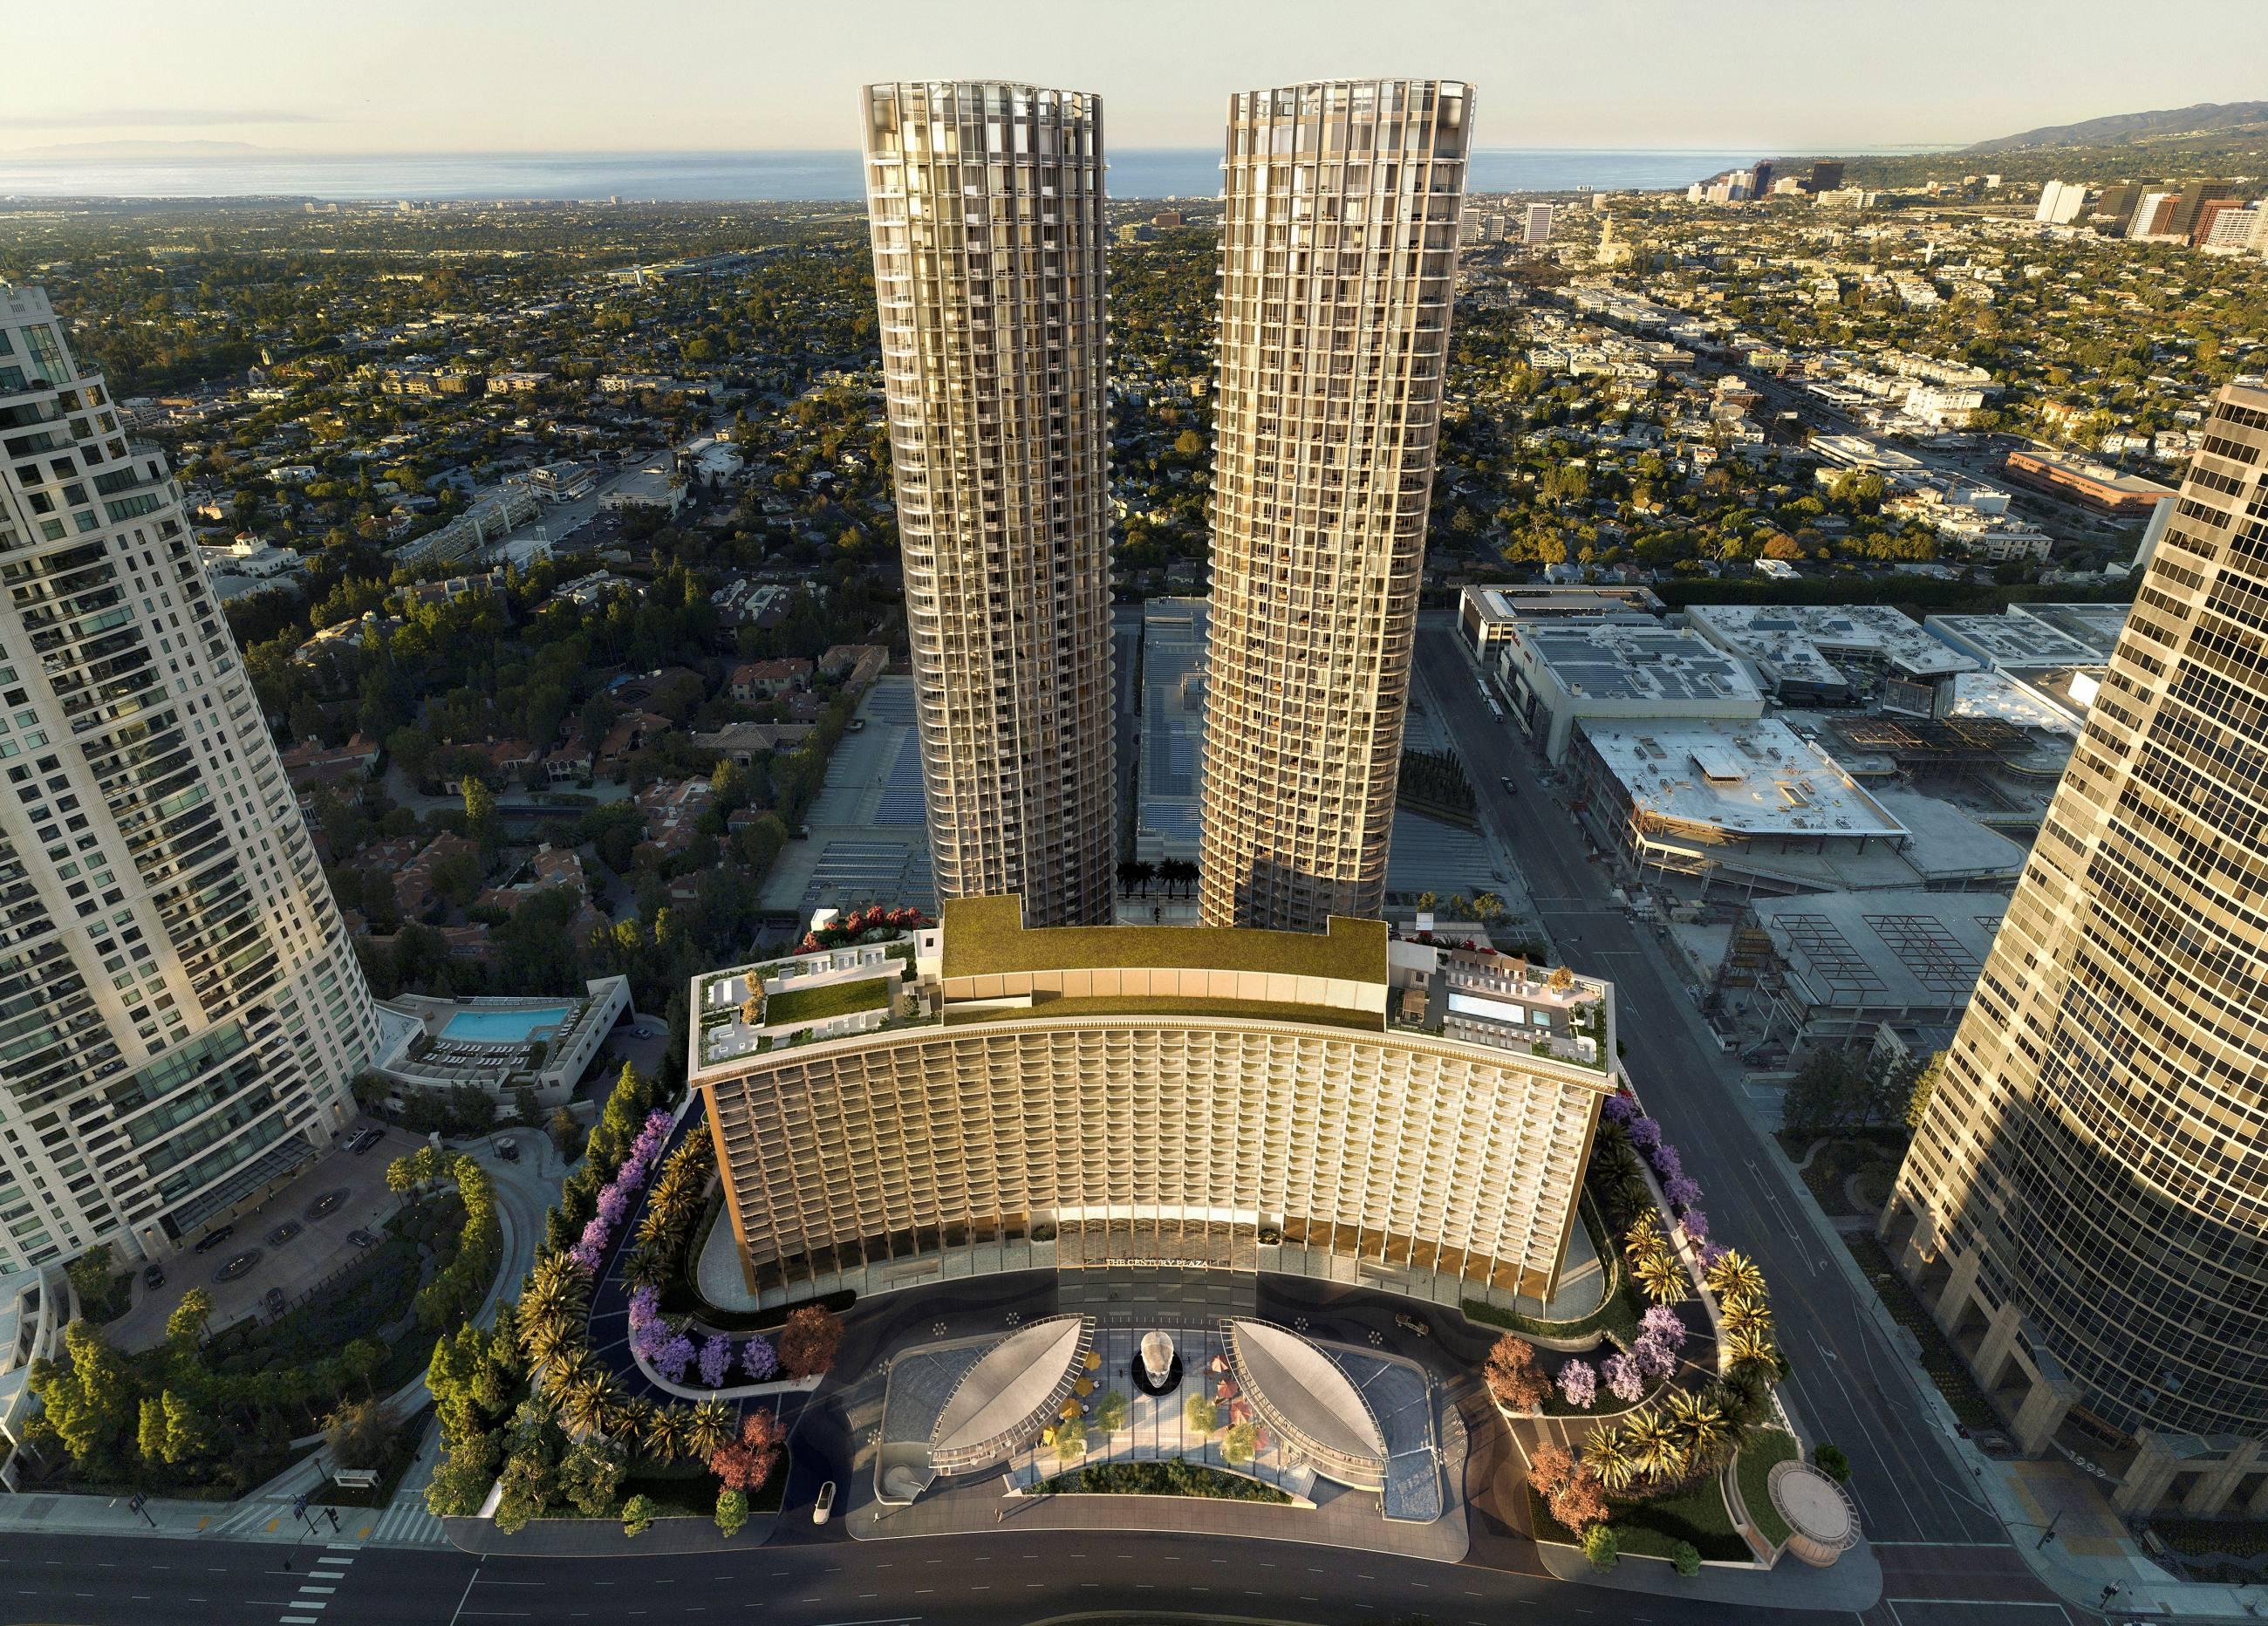 Rendering of the Fairmont Century Plaza